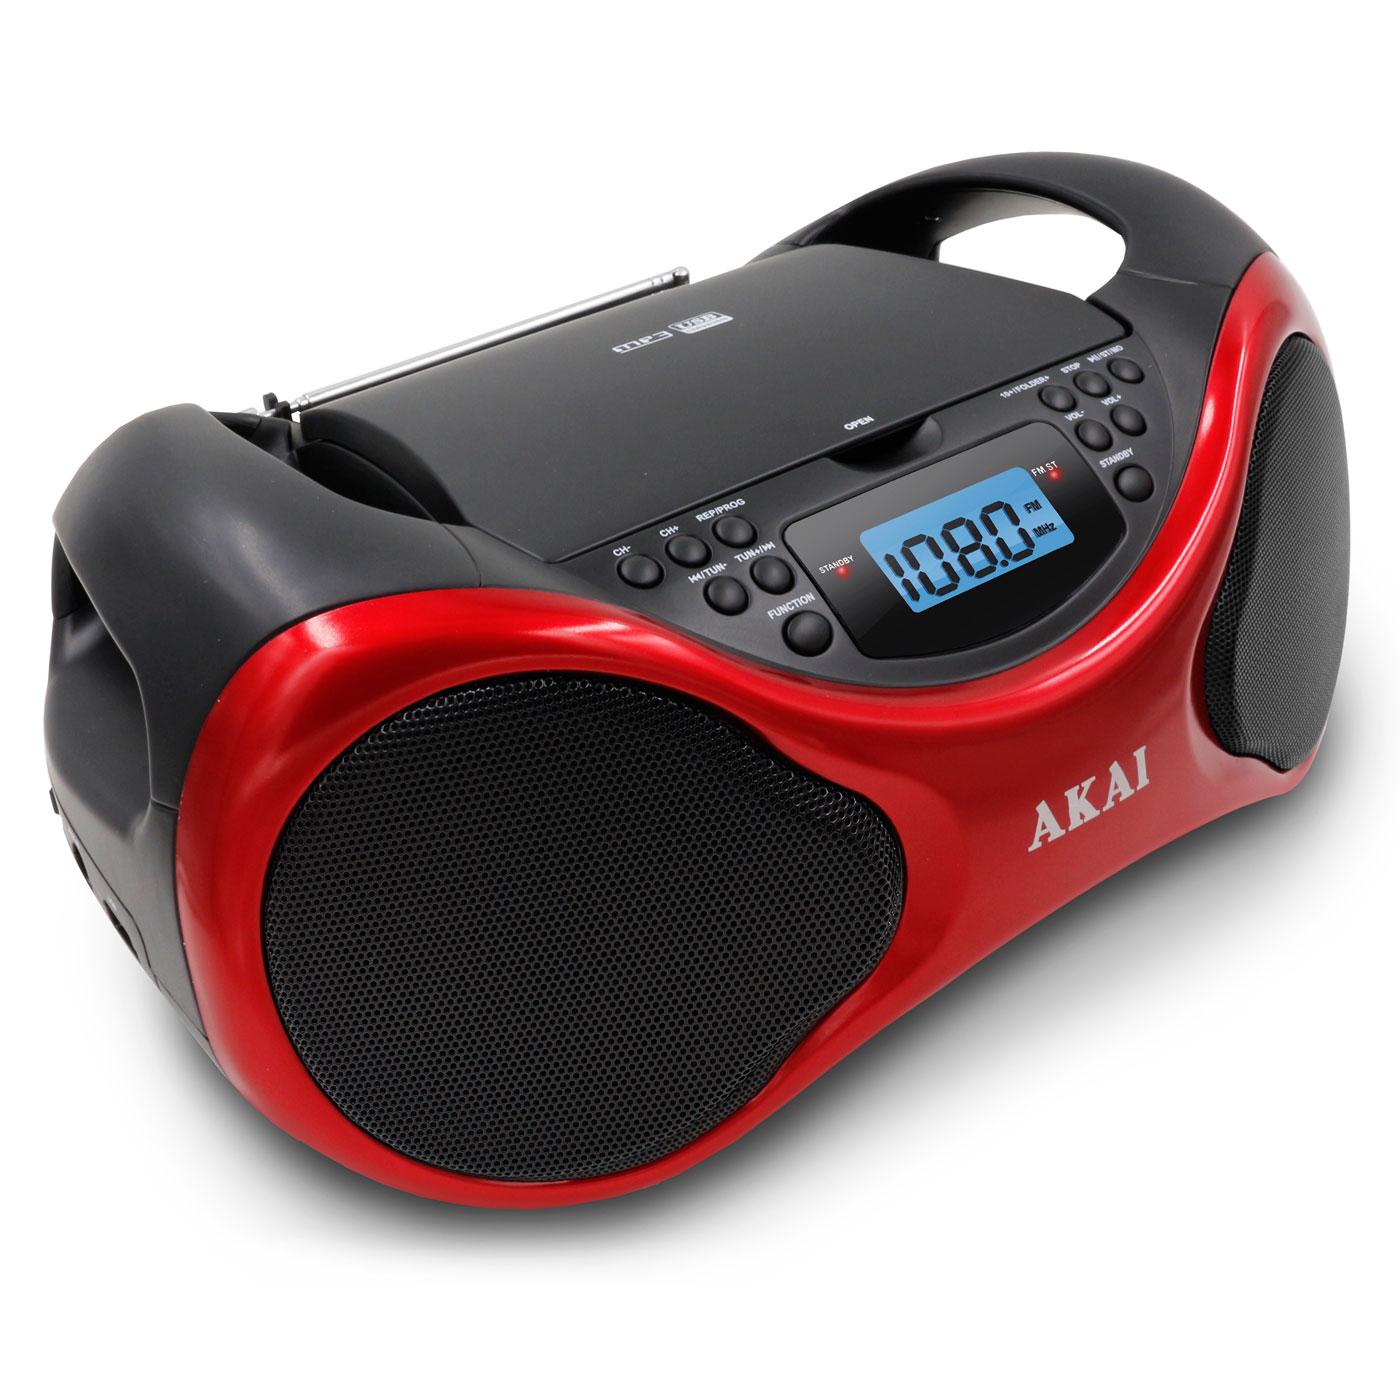 Radio & radio réveil Akai AB-40R Scorpio Boombox  Radio CD MP3 USB avec entrée auxiliaire